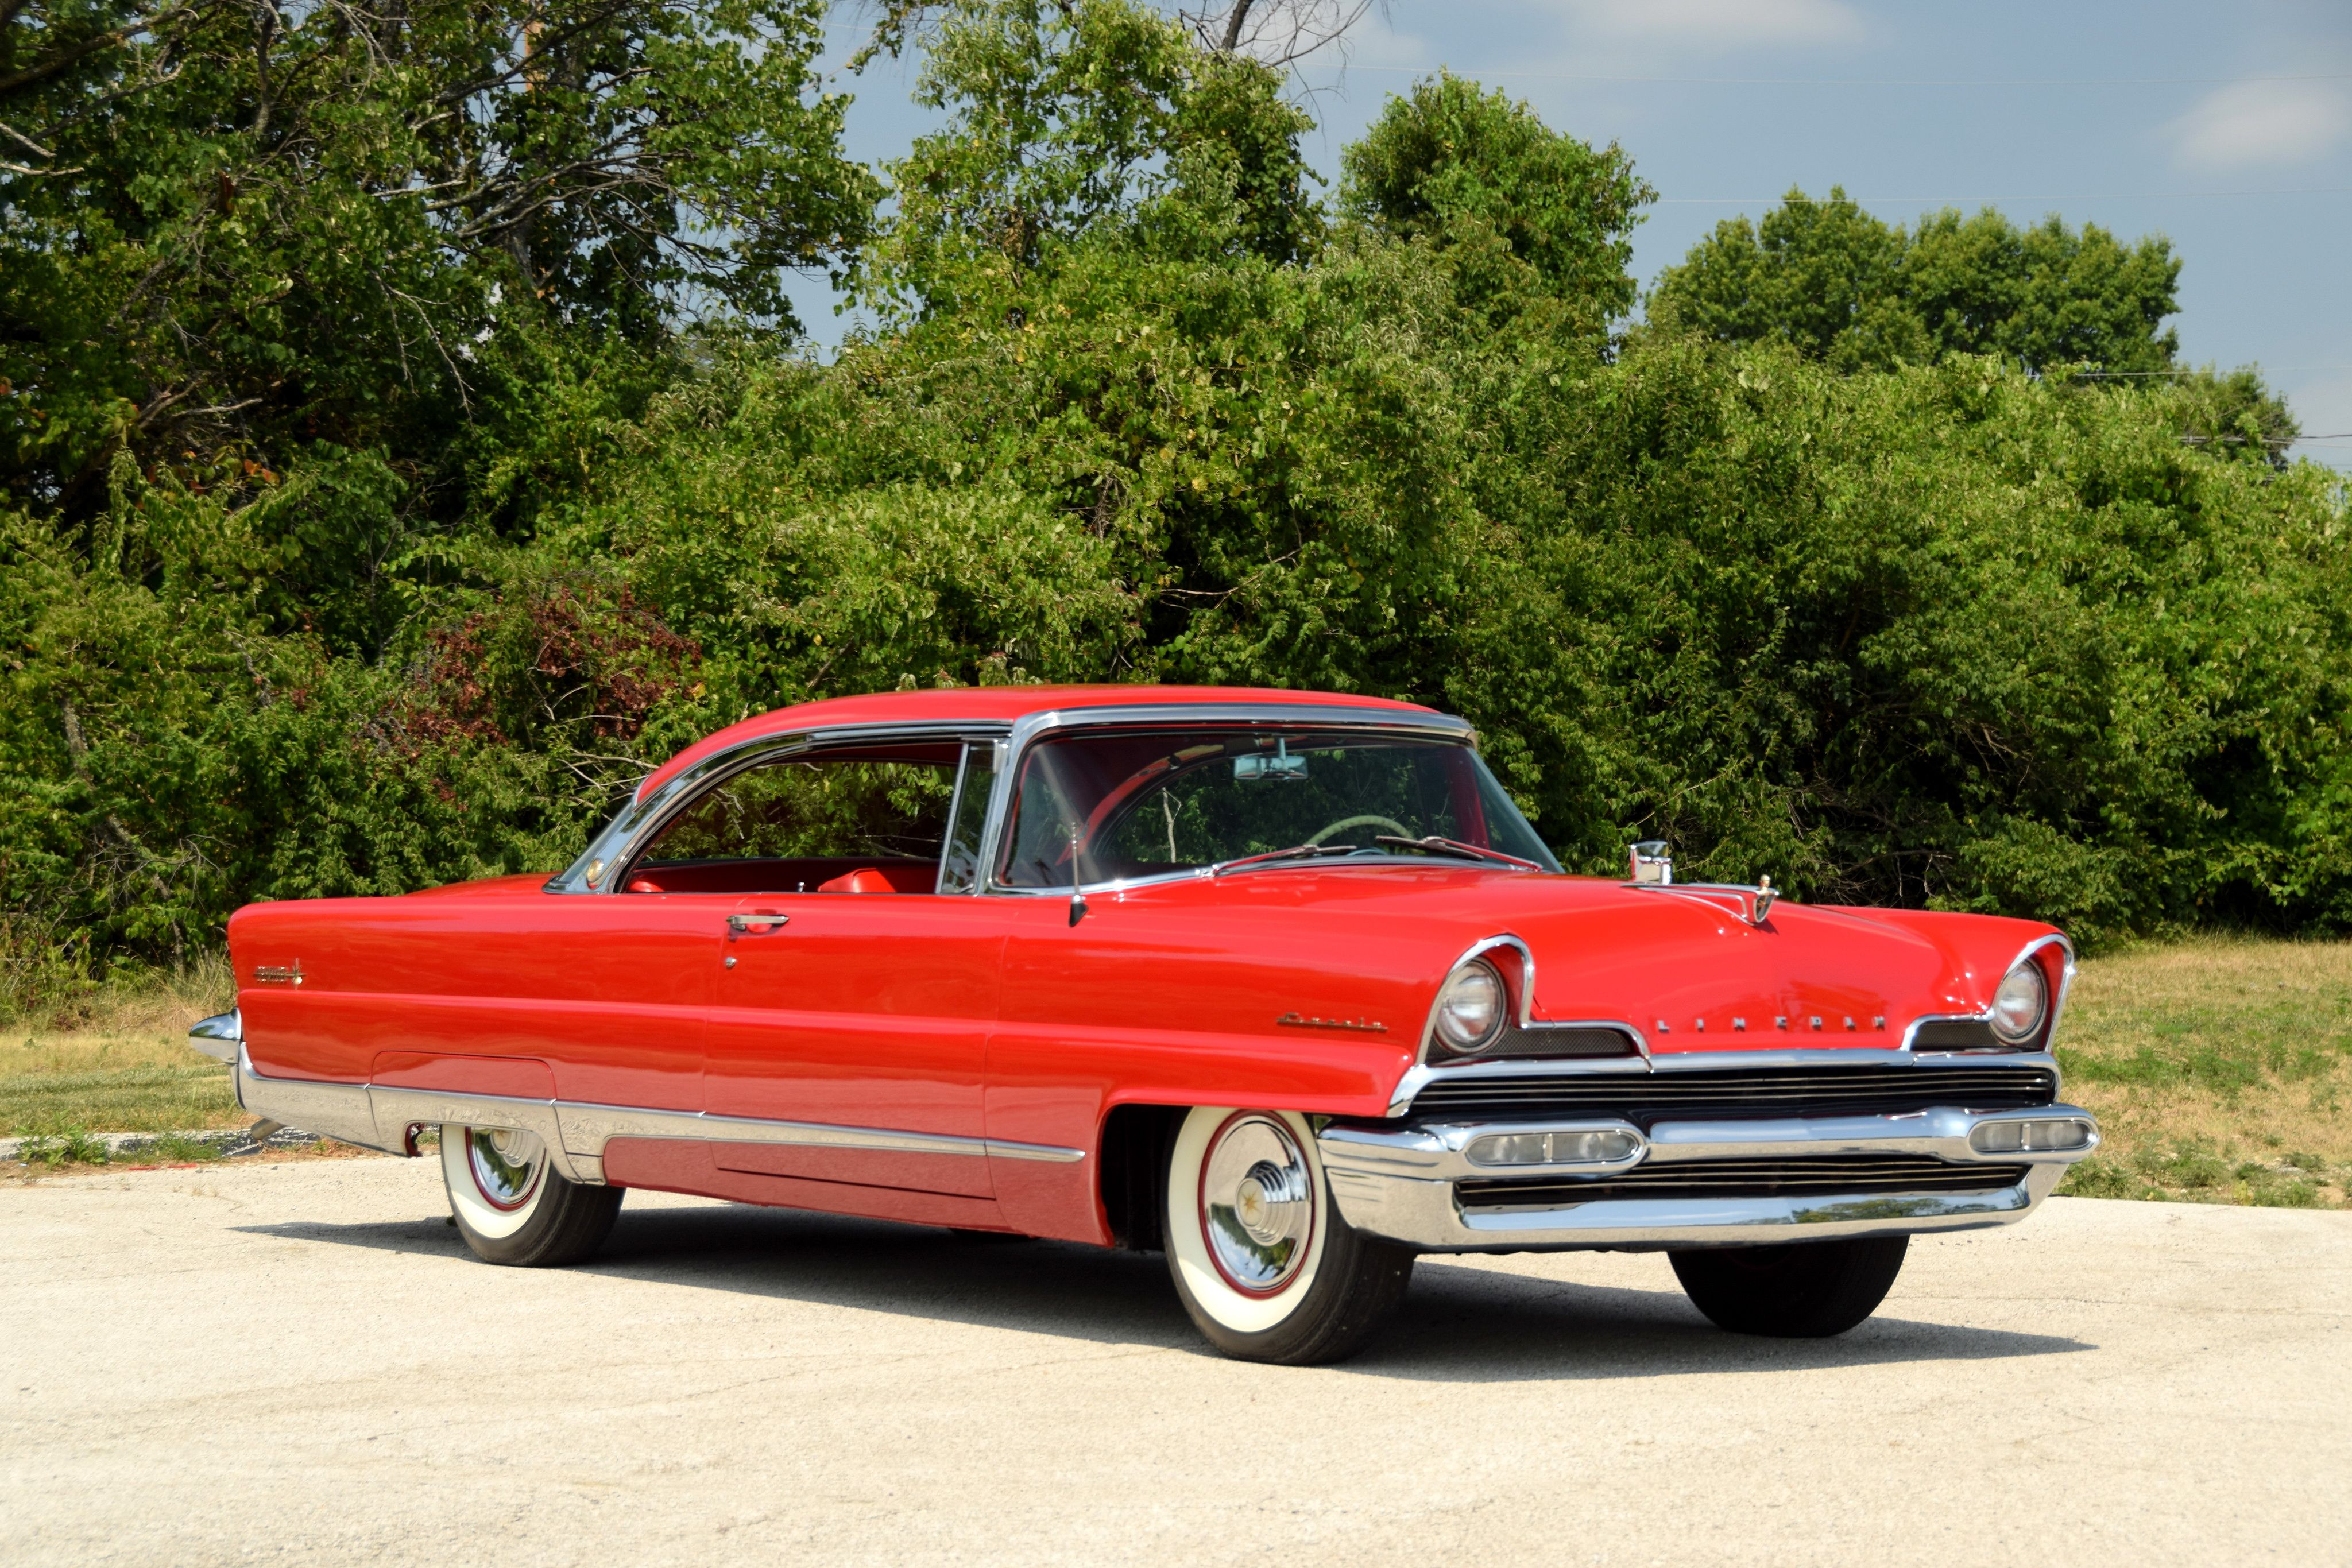 dealership mercury showroom fitzgerald shot and january lincoln car jordan of